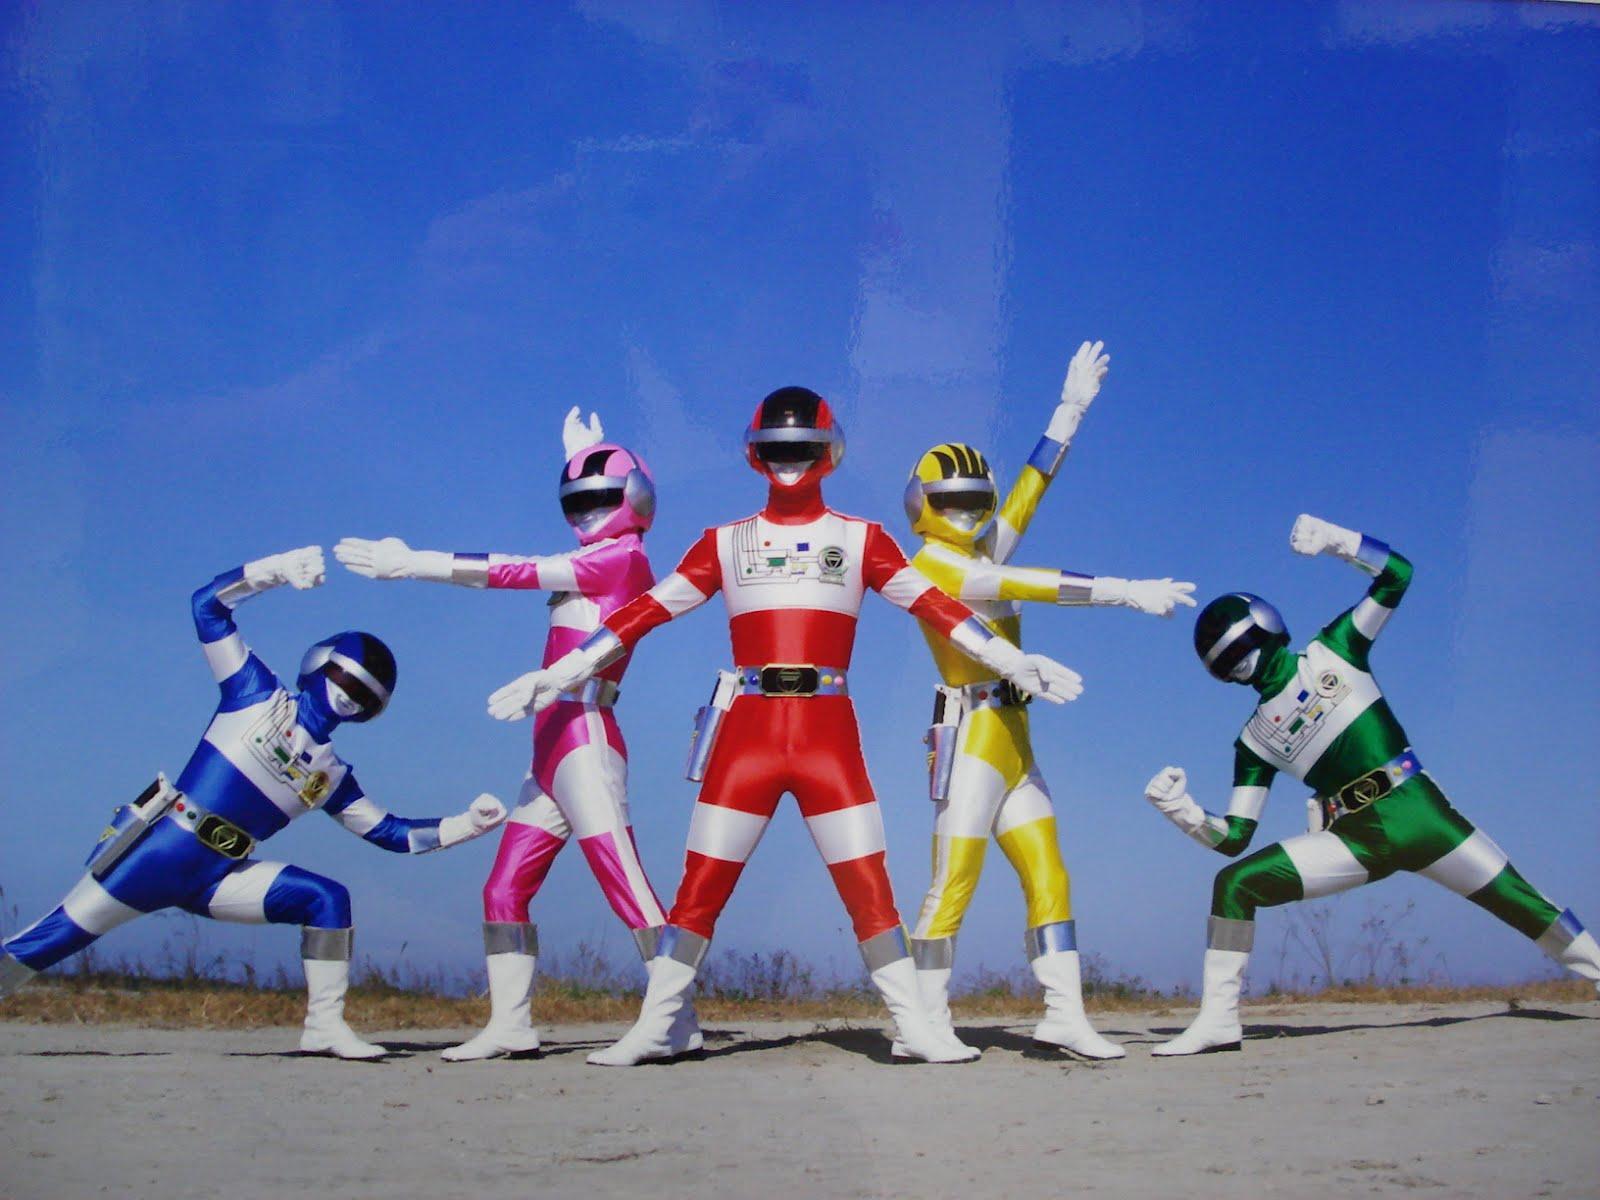 Choudenshi Bioman English Dubbed Super Sentai Show Run in the Philippines Retro Pilipinas Feature